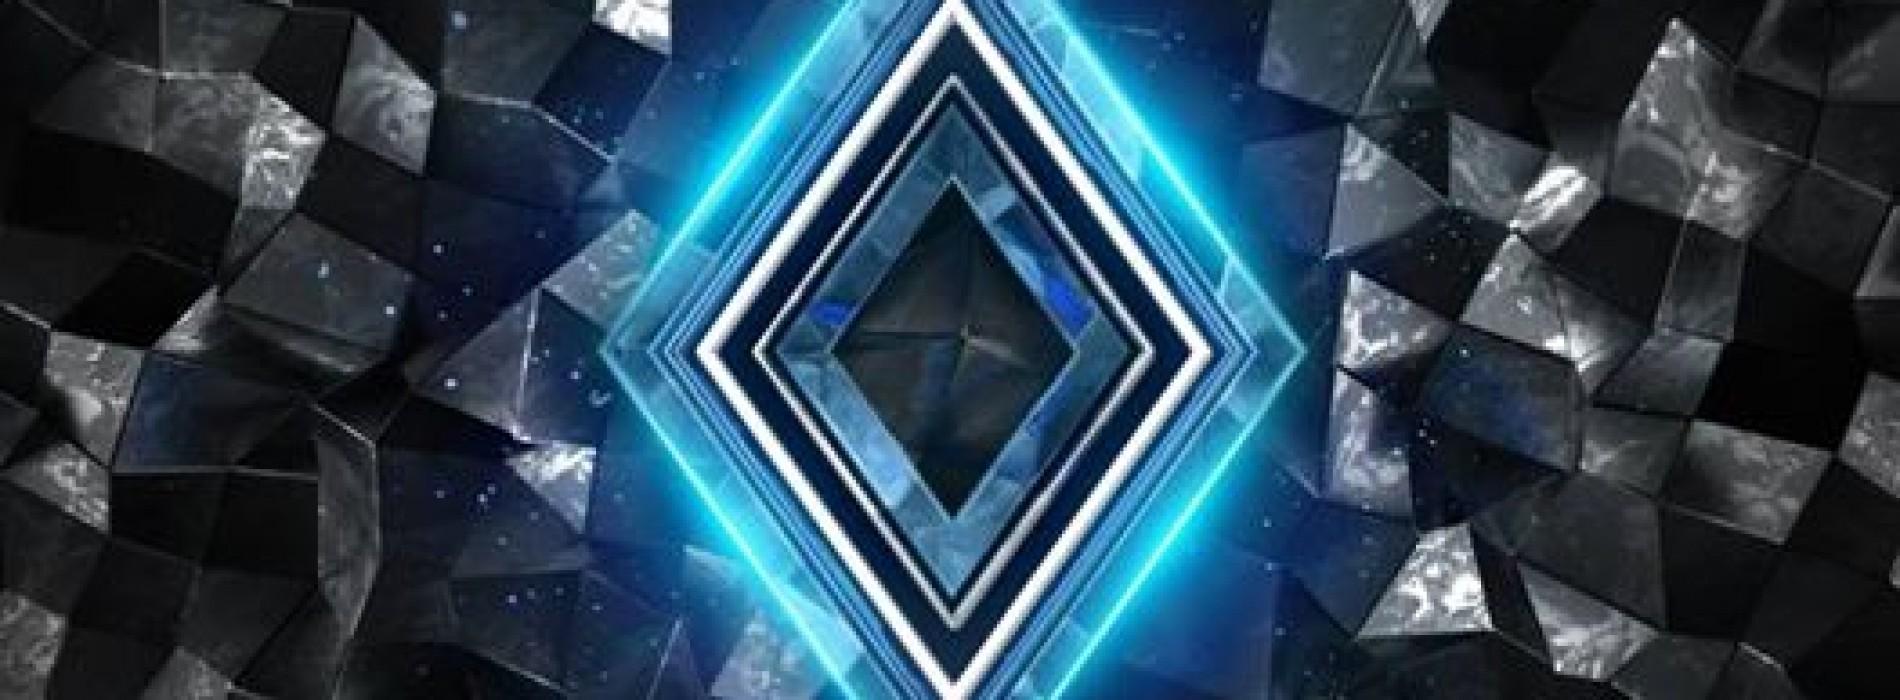 Dropwizz – Oblivion (Original Mix)